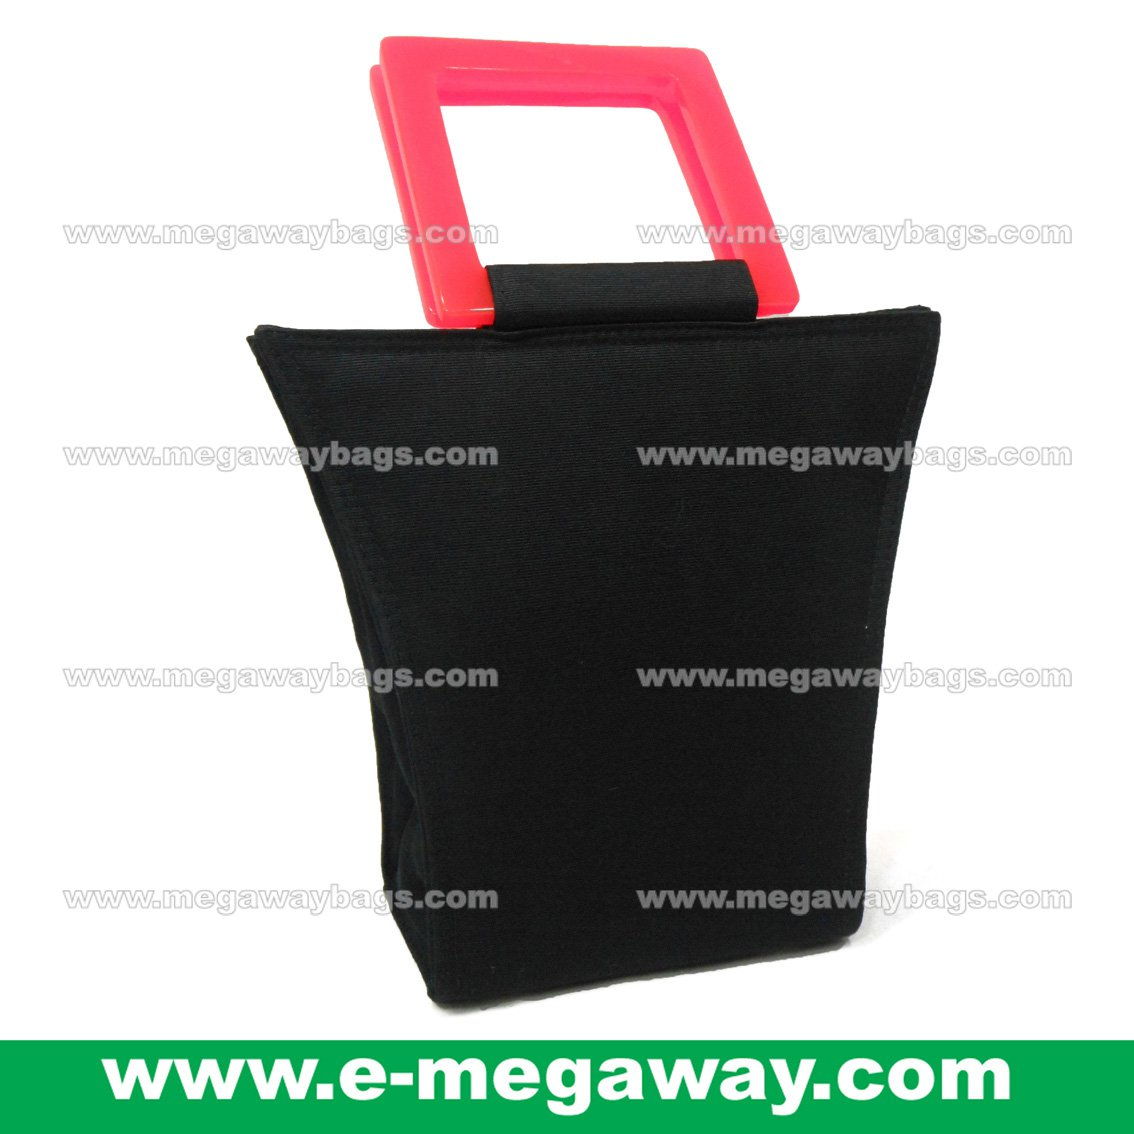 Simply Dorrie Fashion Handbag Tote Purses Evening Clutch Wallet Satchels MegawayBags #CC-0955